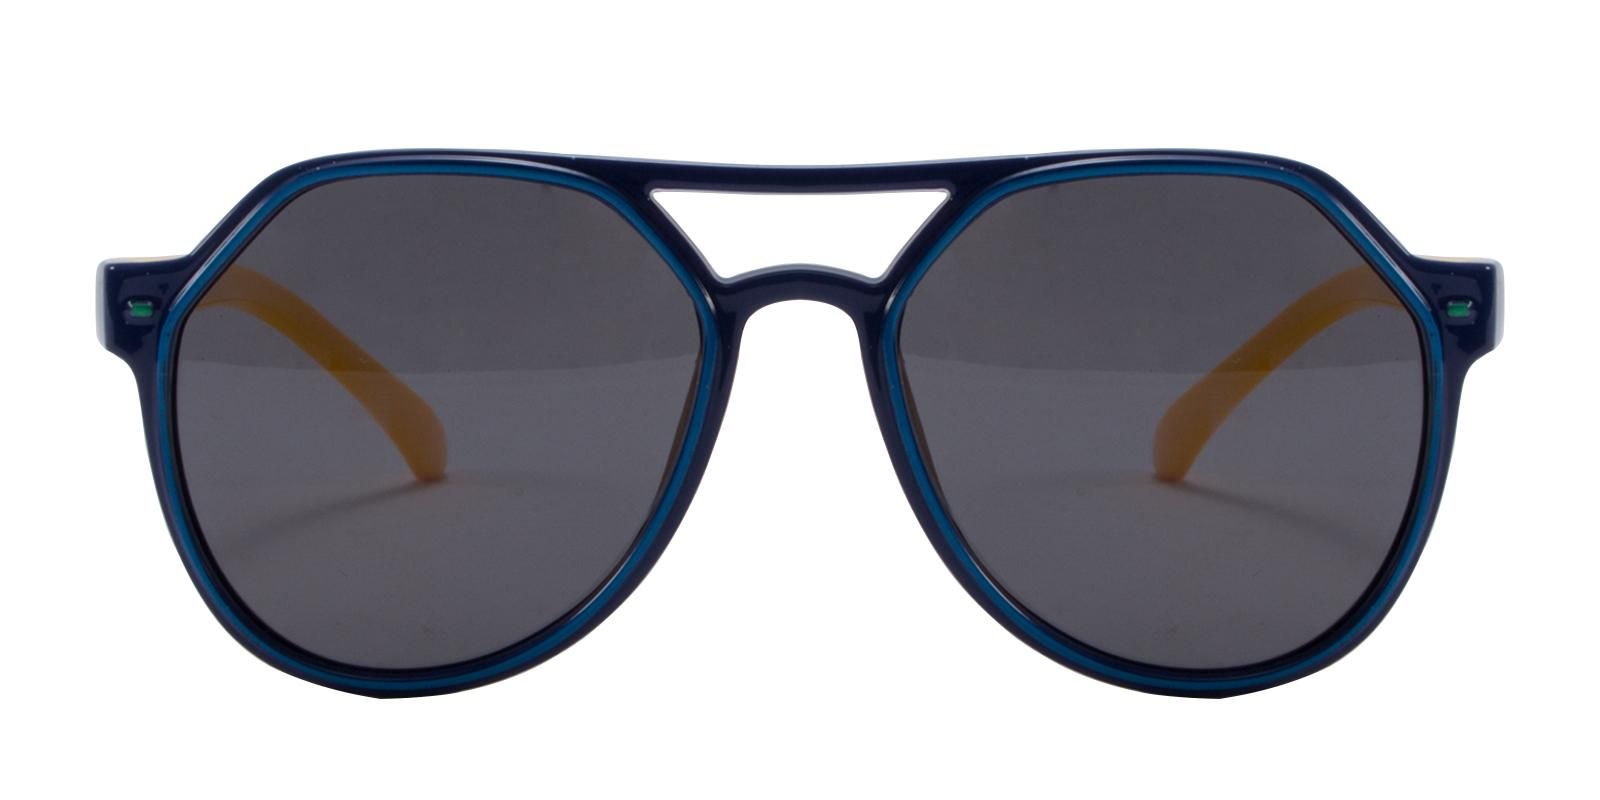 Pilot Multicolor TR Sunglasses , UniversalBridgeFit Frames from ABBE Glasses